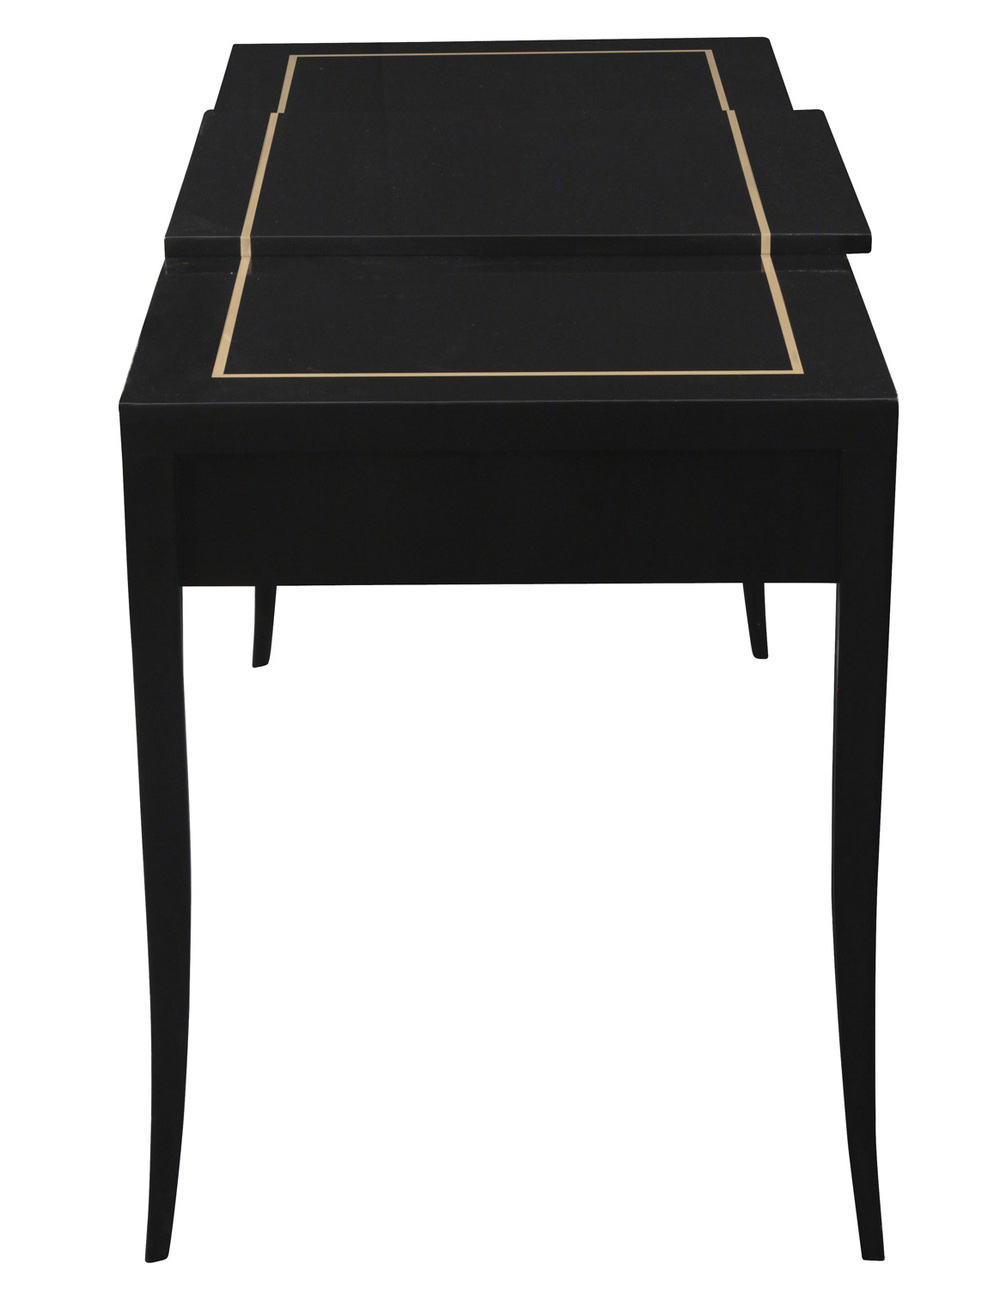 Parzinger 150 blk flip mirror top vanity4 detail3 hires.jpg